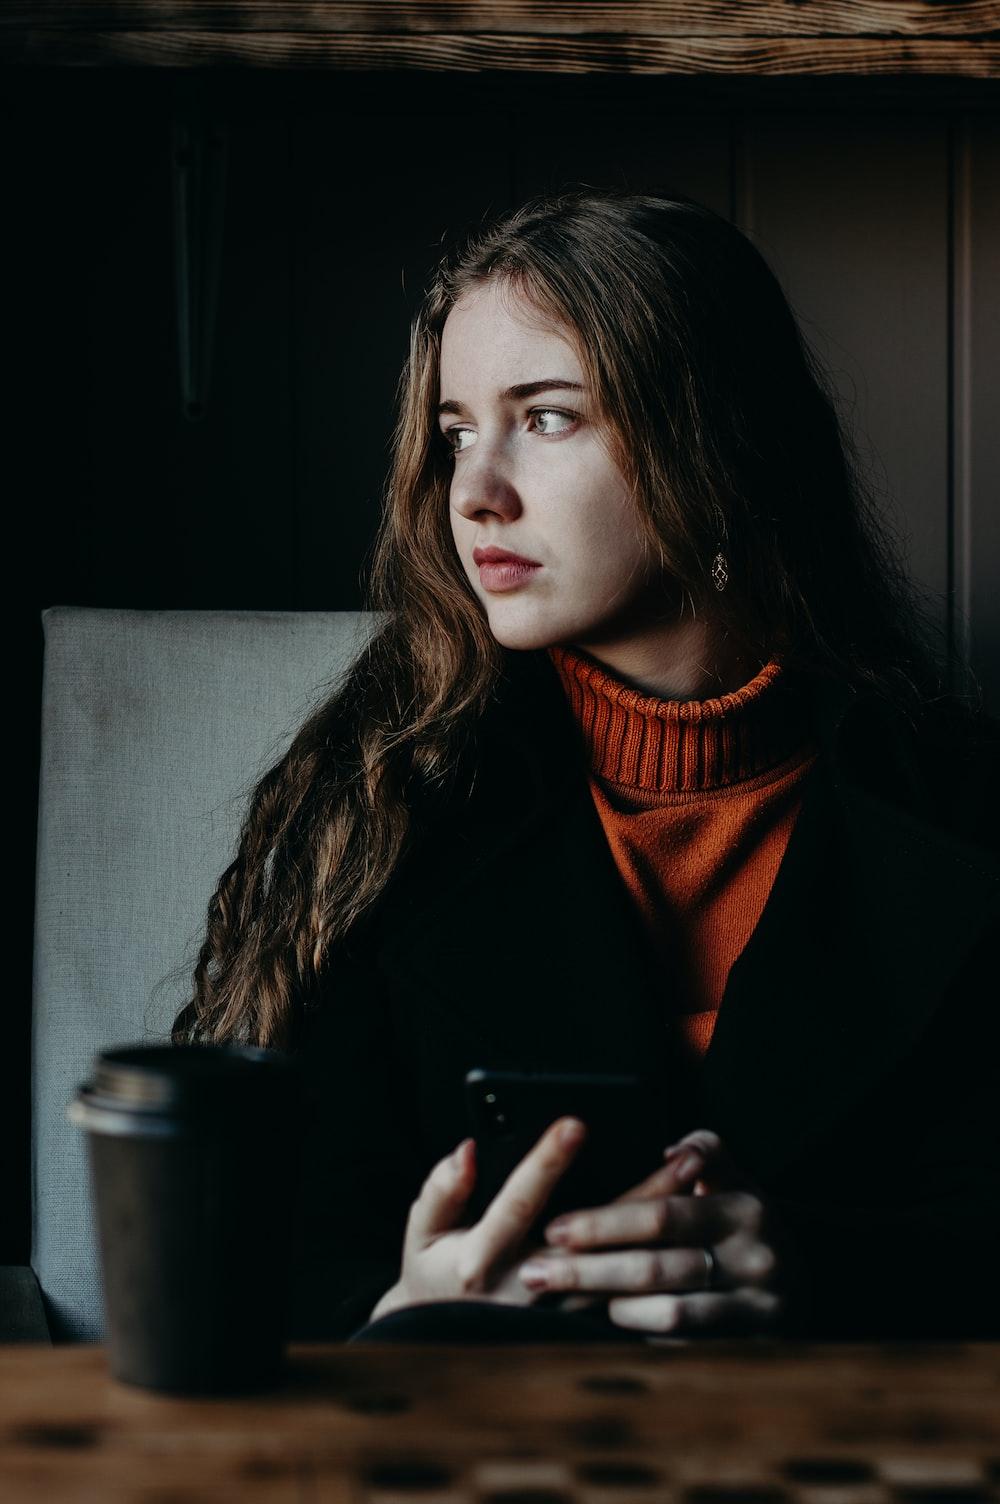 woman wearing black jacket holding smartphone